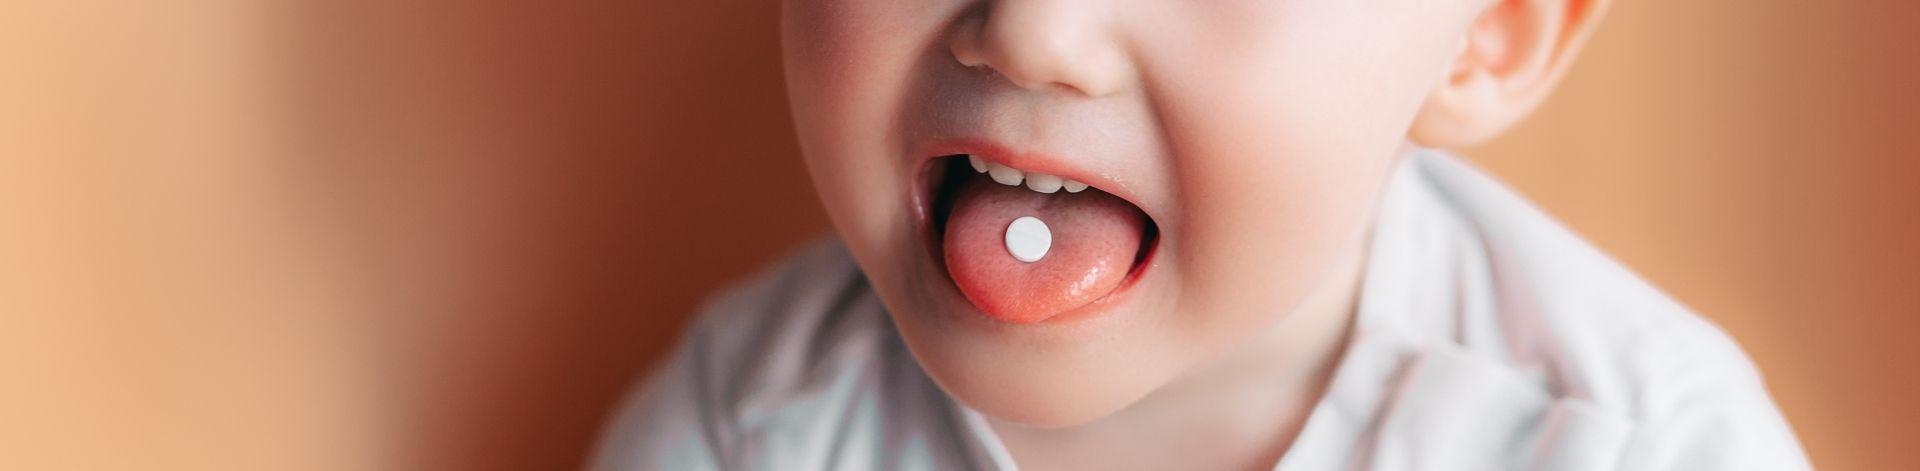 Kind mit Tablette